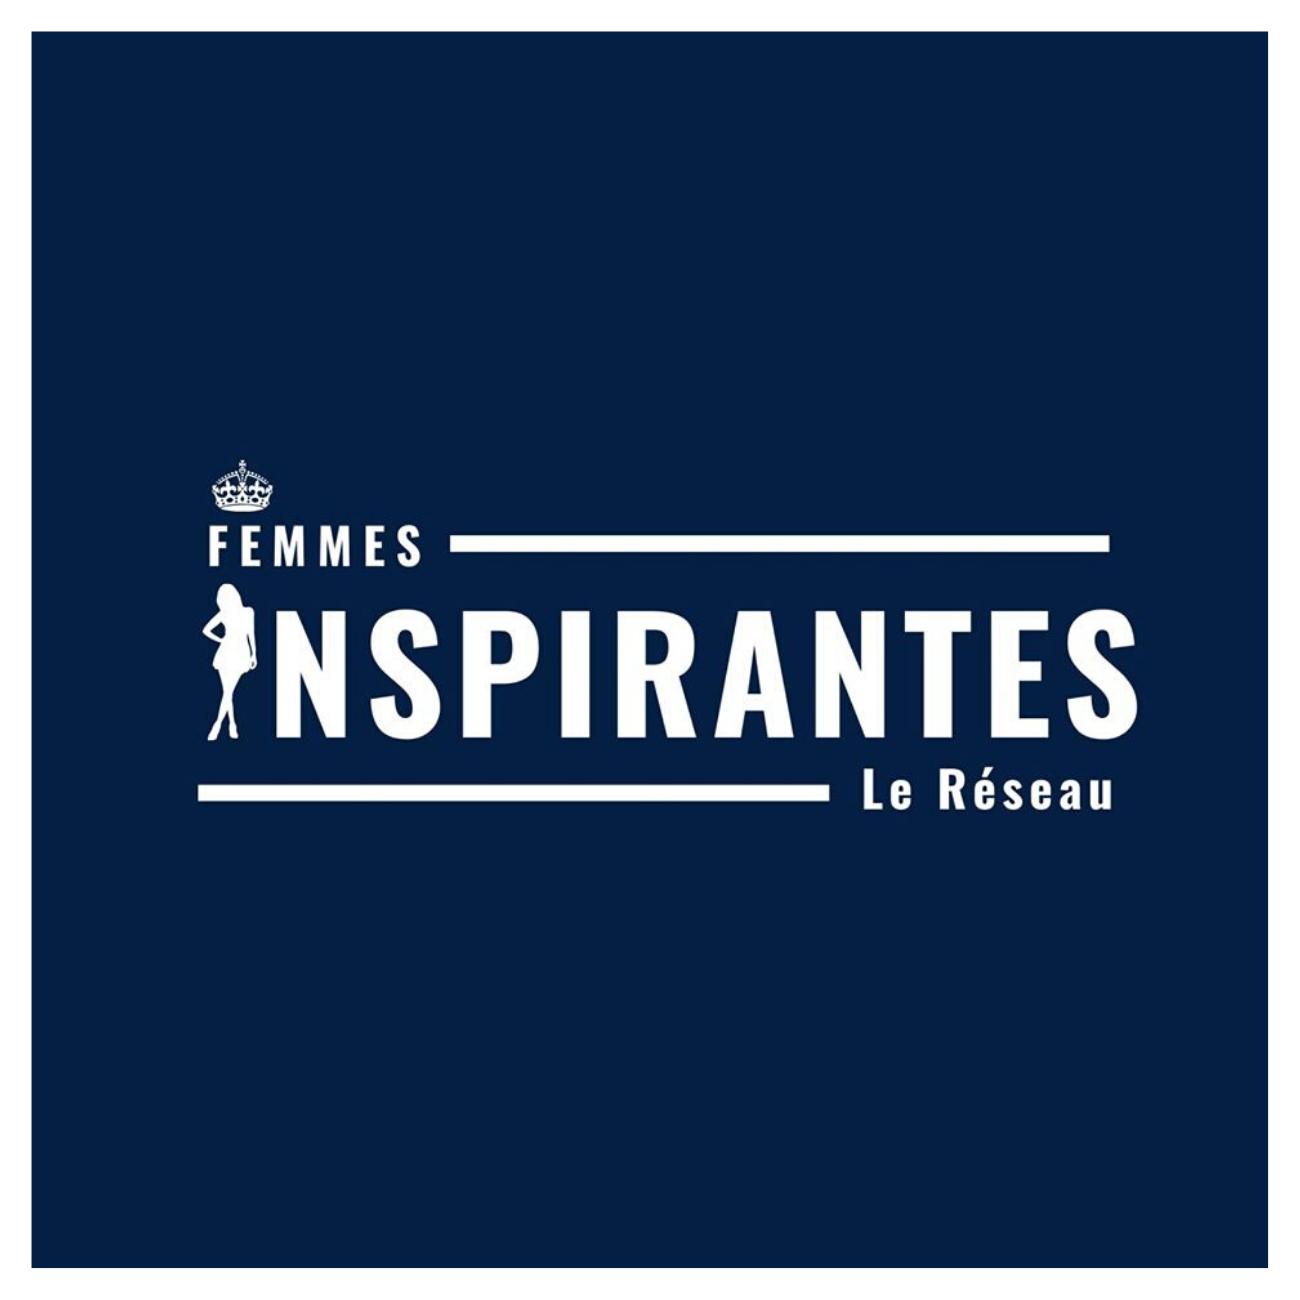 Réseau Femmes Inspirantes